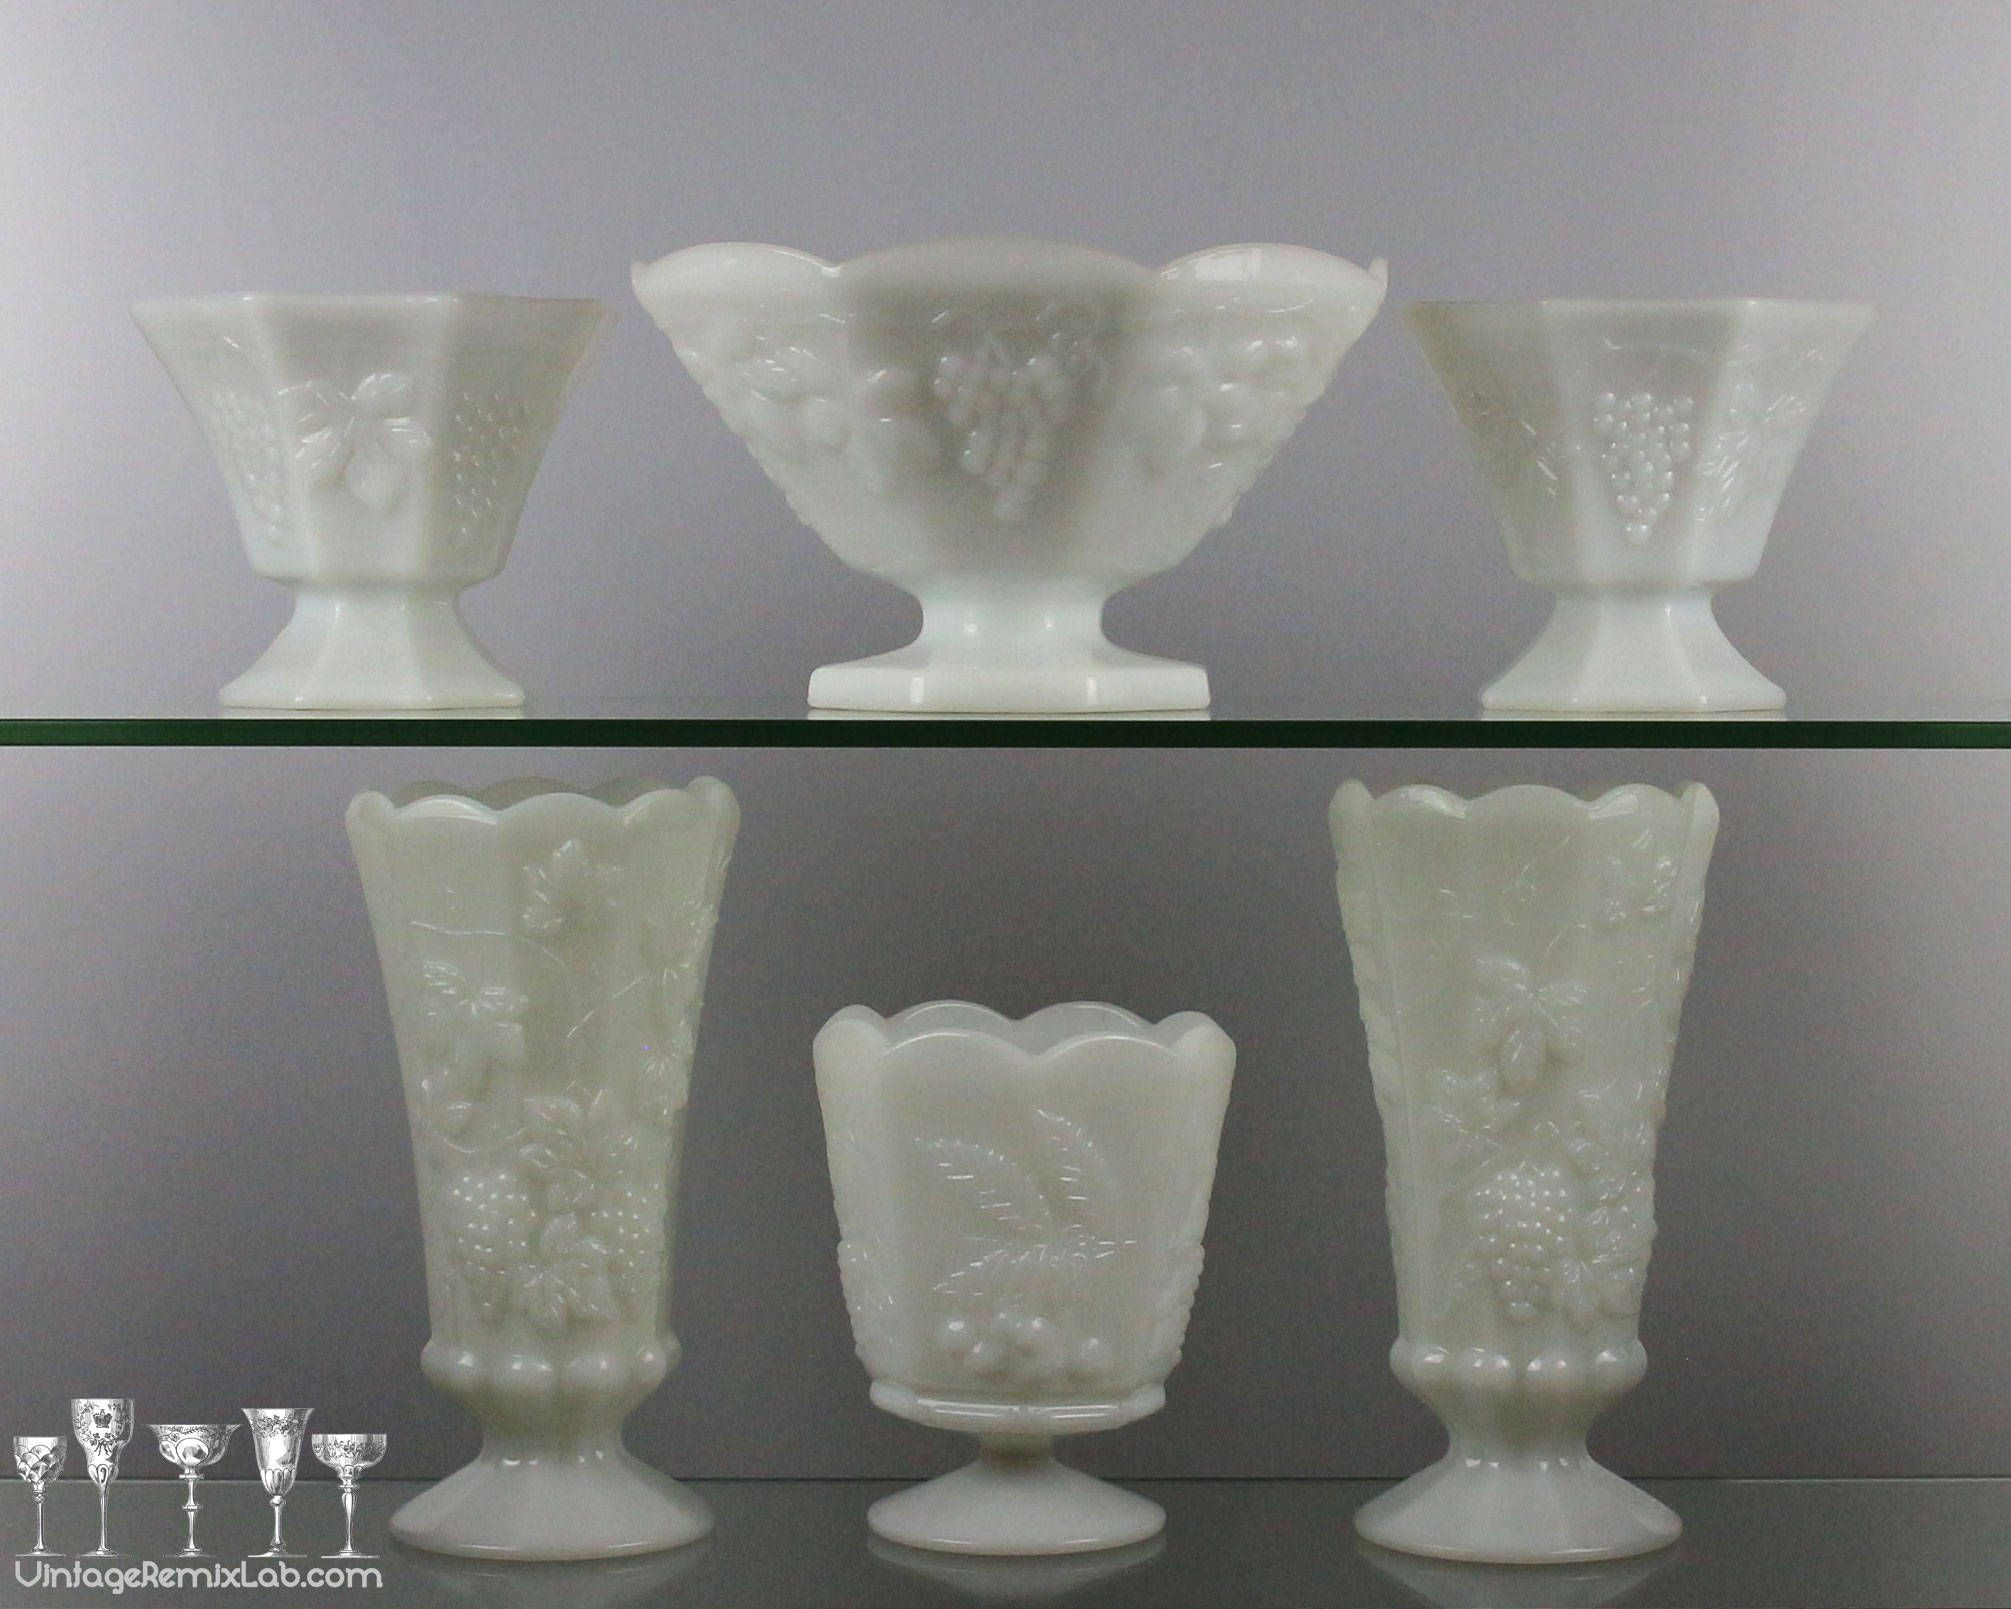 silver mercury hurricane vase of glass pedestal vases photos vintage 1950s milk glass pedestal vases with glass pedestal vases photos vintage 1950s milk glass pedestal vases e280a2 paneled g